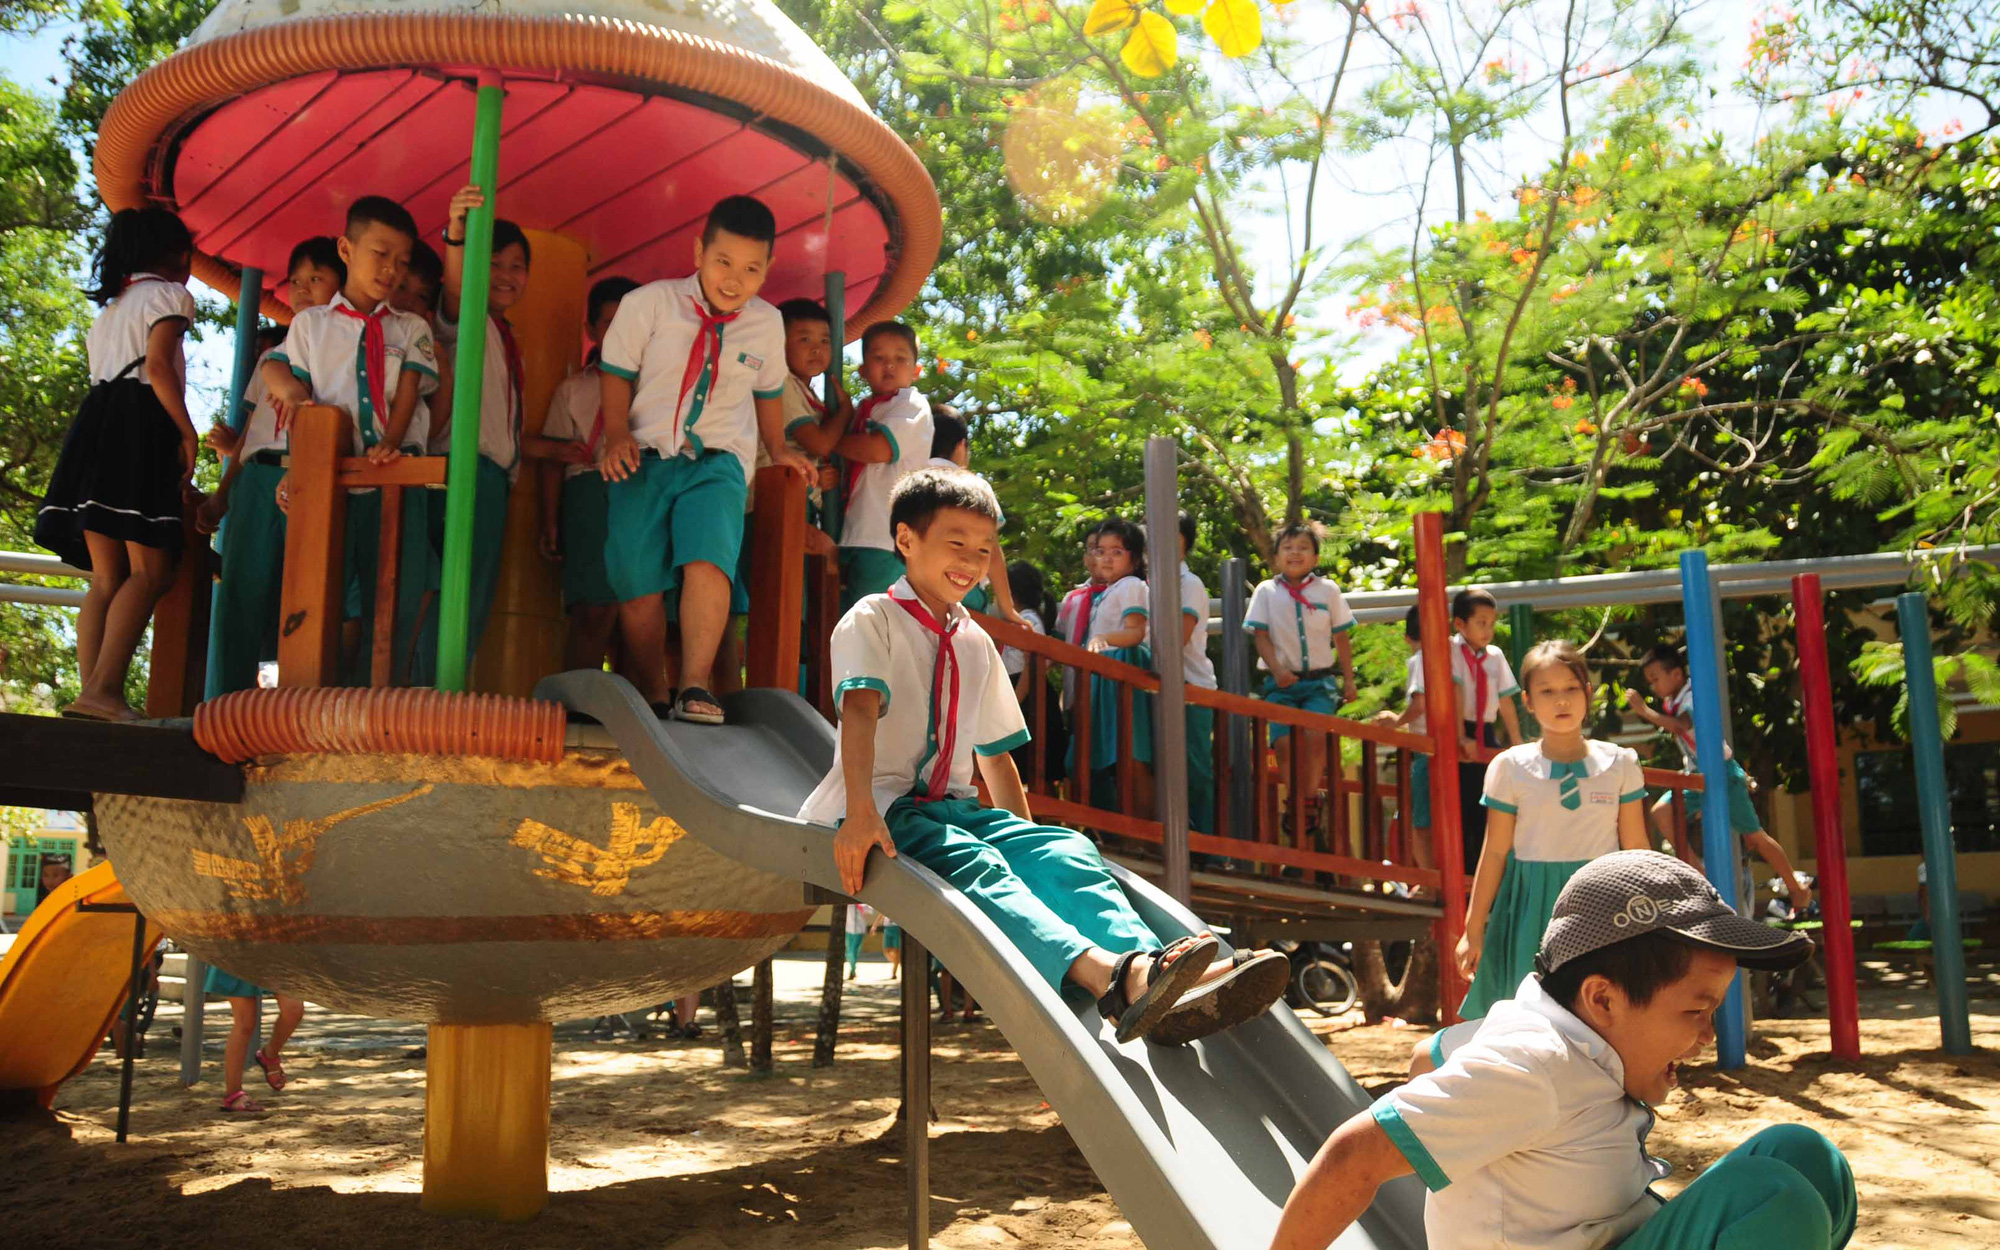 Koreans help build playgrounds on war-torn land in Vietnam